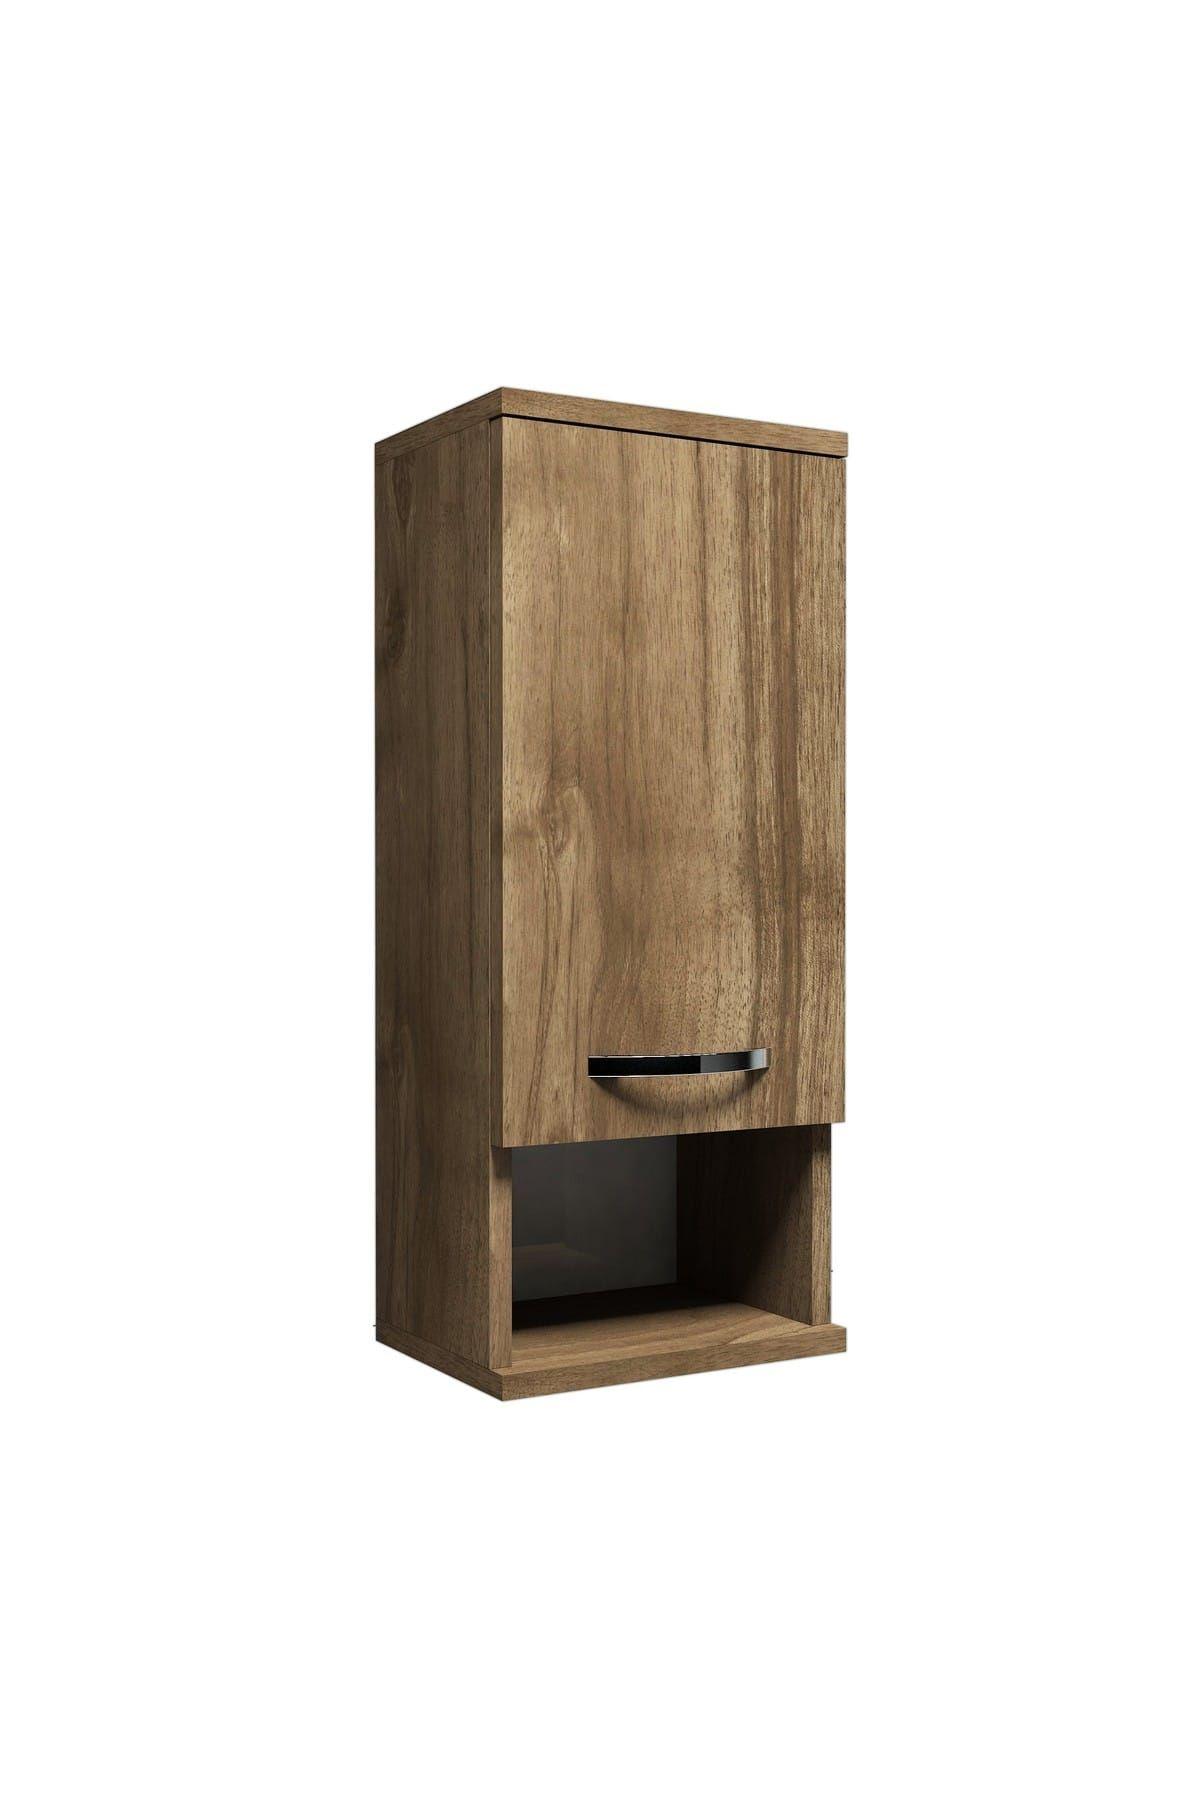 Dulap pentru baie, Mis Homs, nuc, 71 x 30 x 22 cm, PAL 18 mm